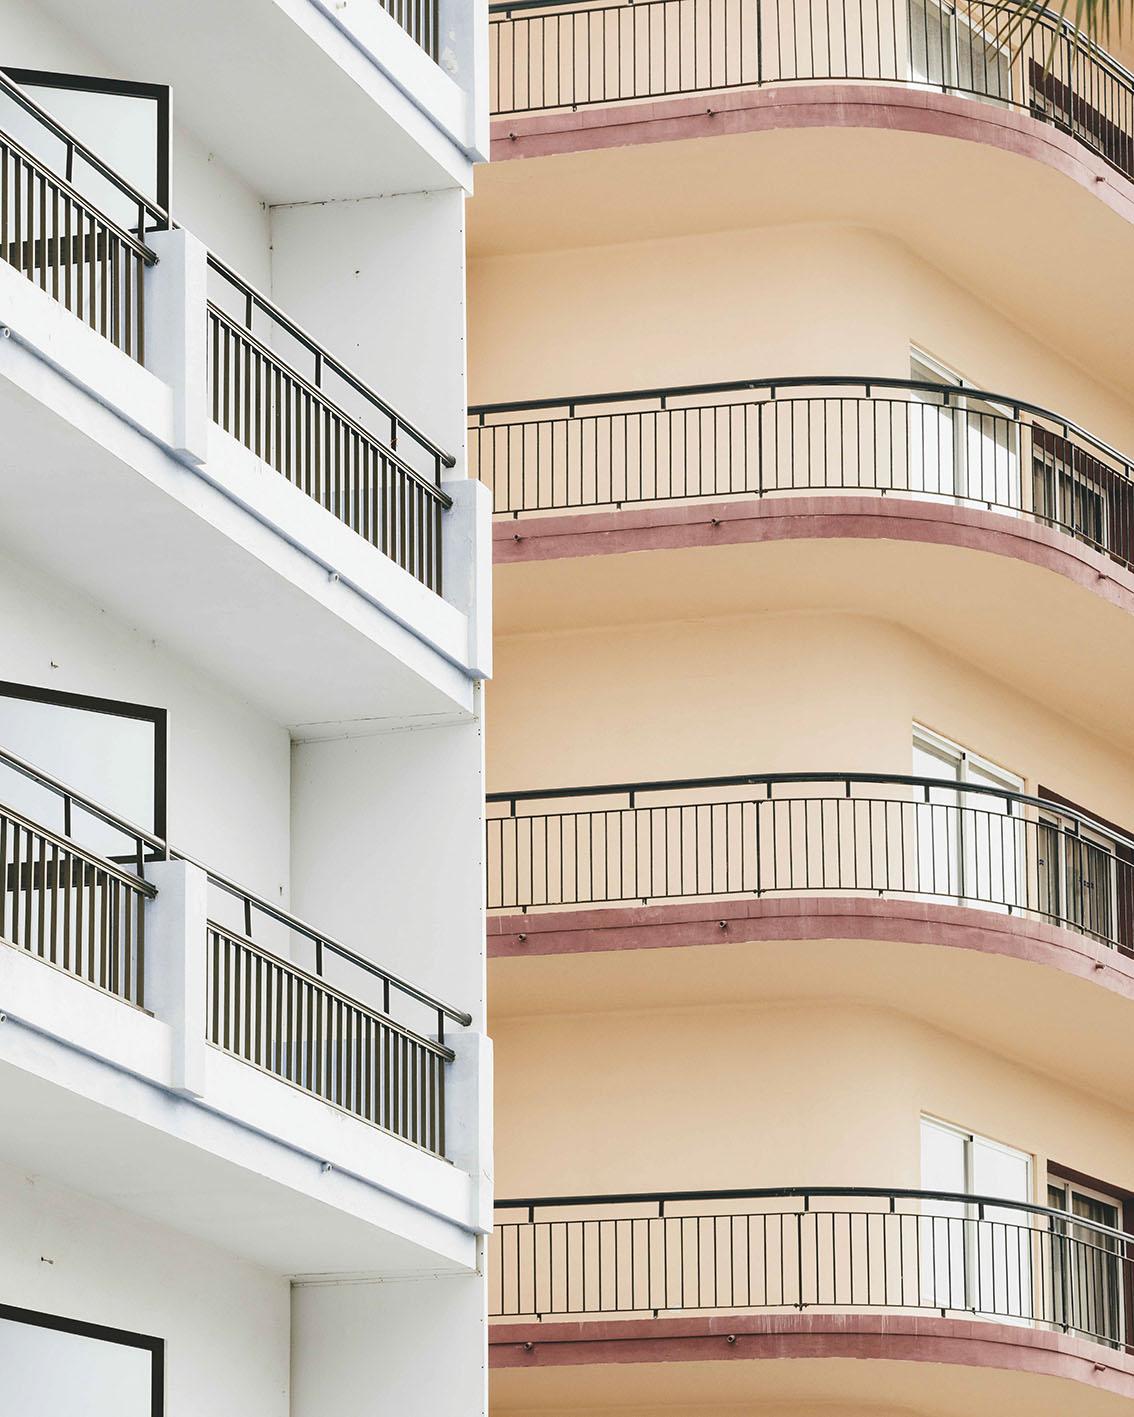 yosigo_arquitectura6.jpg